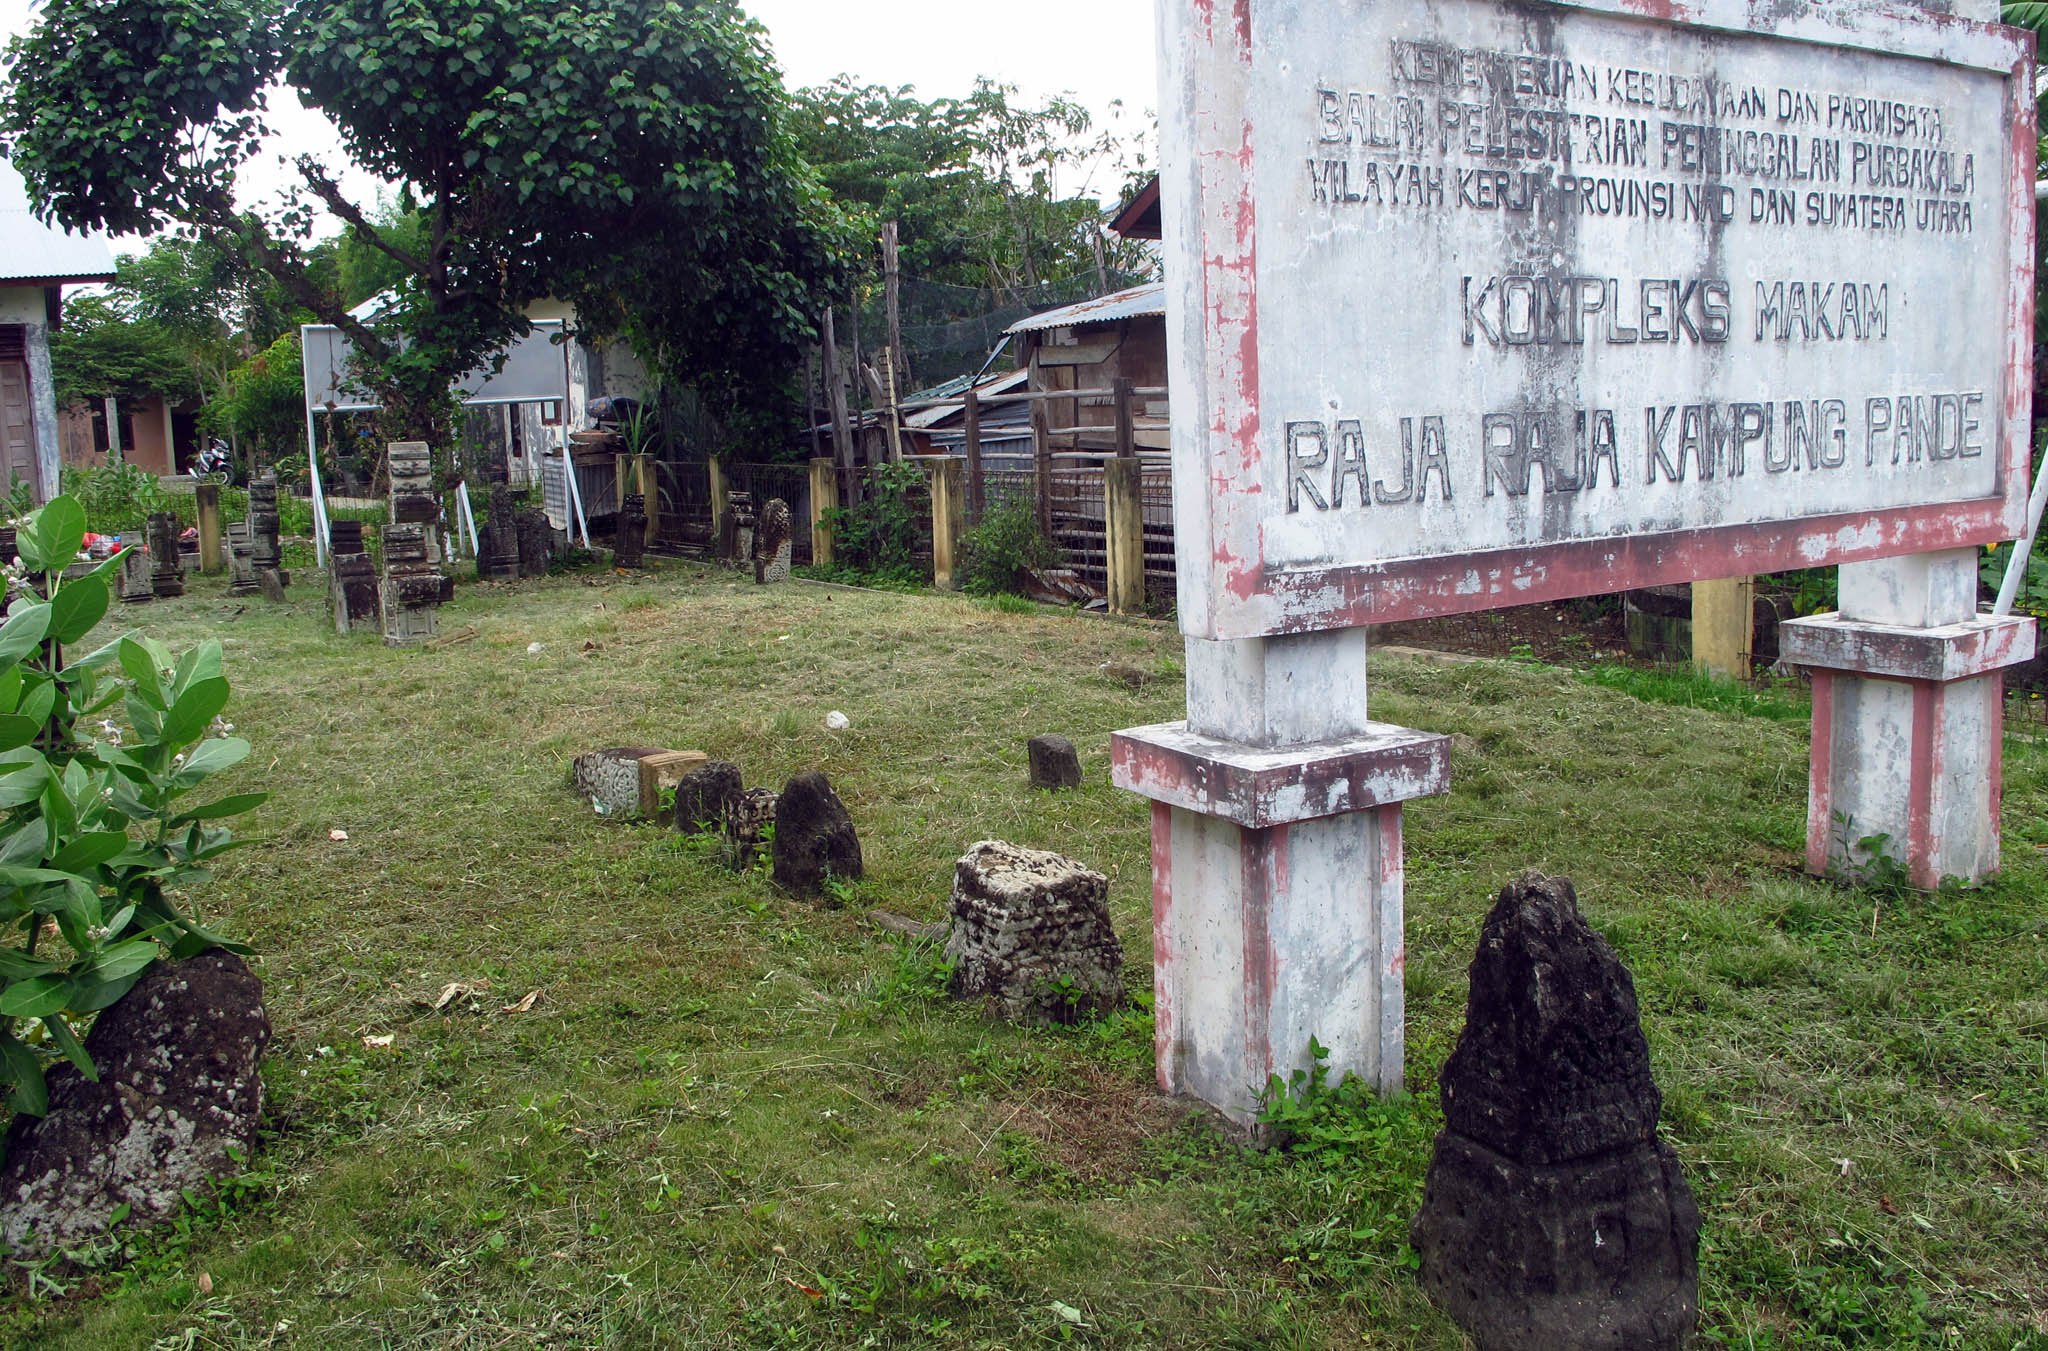 Jejak Aceh Gampong Pande Charming Banda Post Navigation Balai Pelestarian